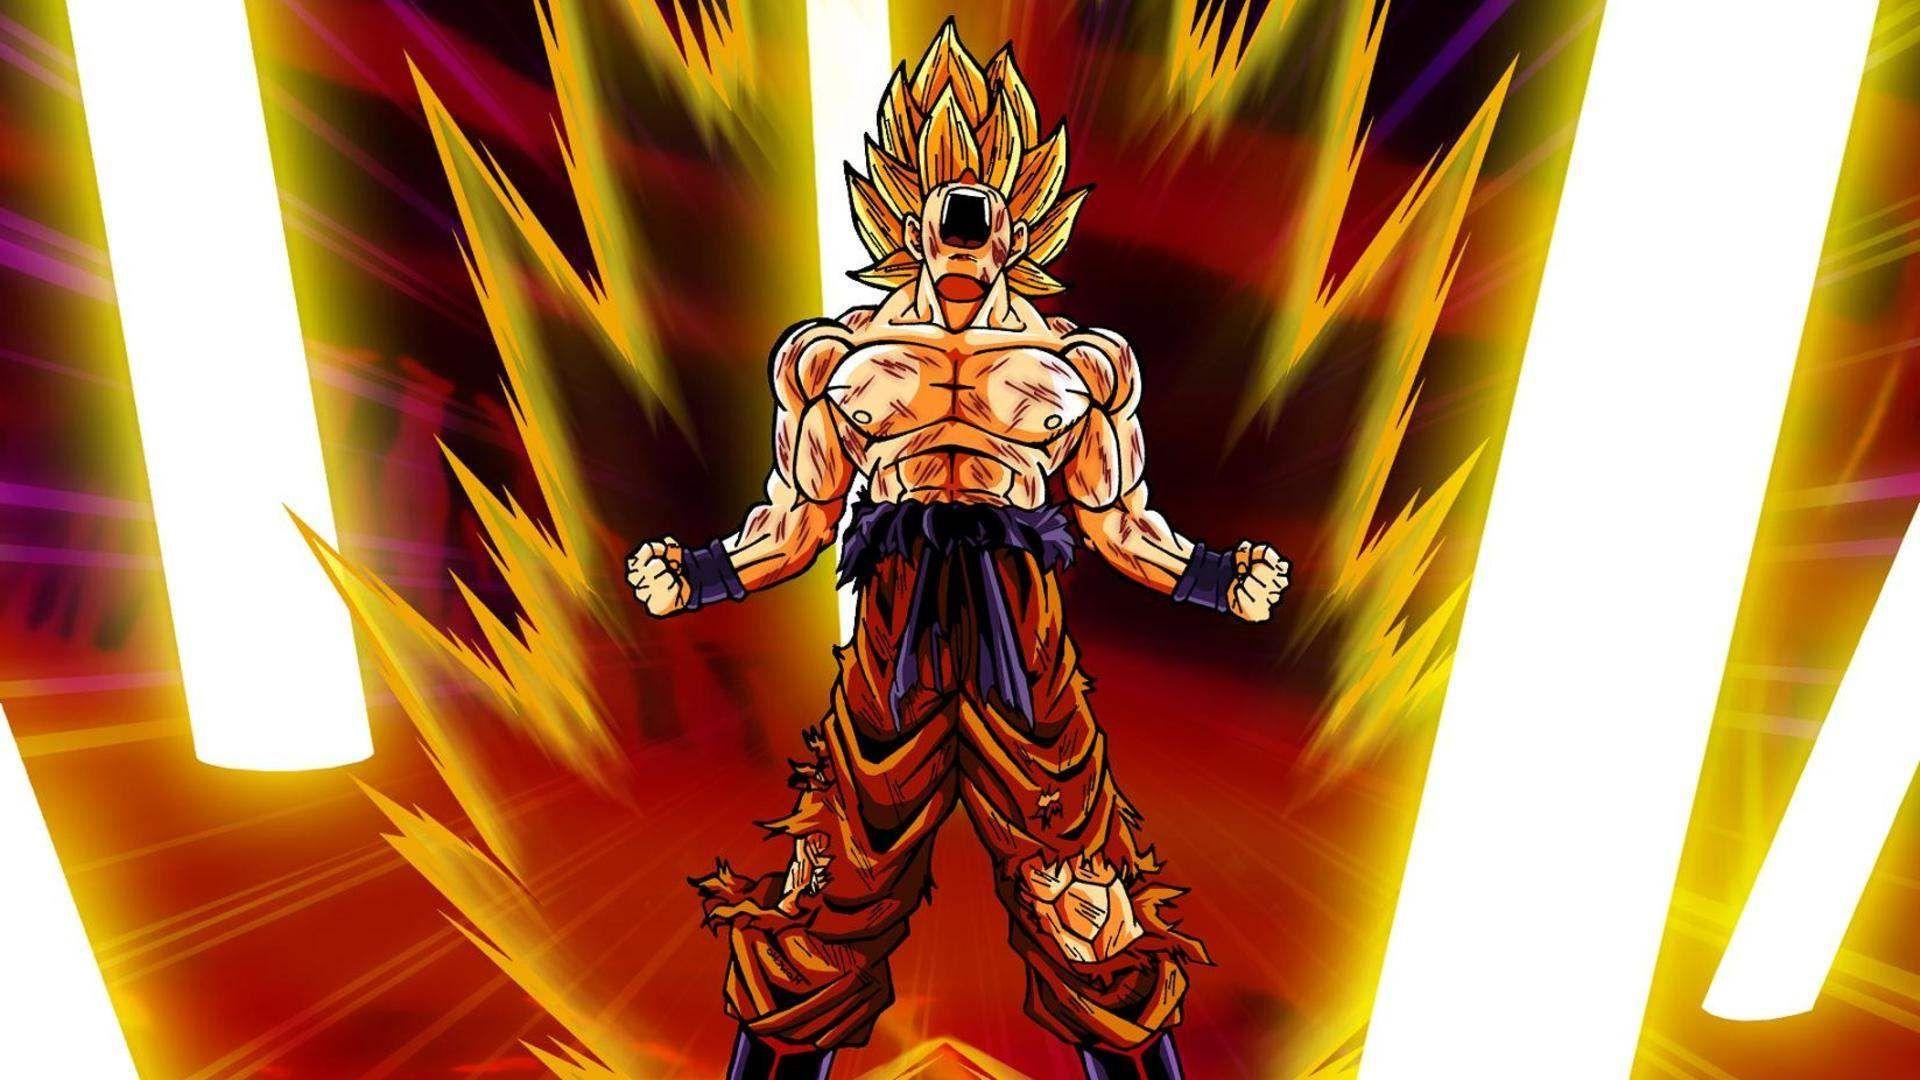 Goku Super Saiyan Dragon Ball Z Wallpapers Download Dragon Ball Z Wallpaper Super Saiyan 50392 Hd Wallpaper Backgrounds Download